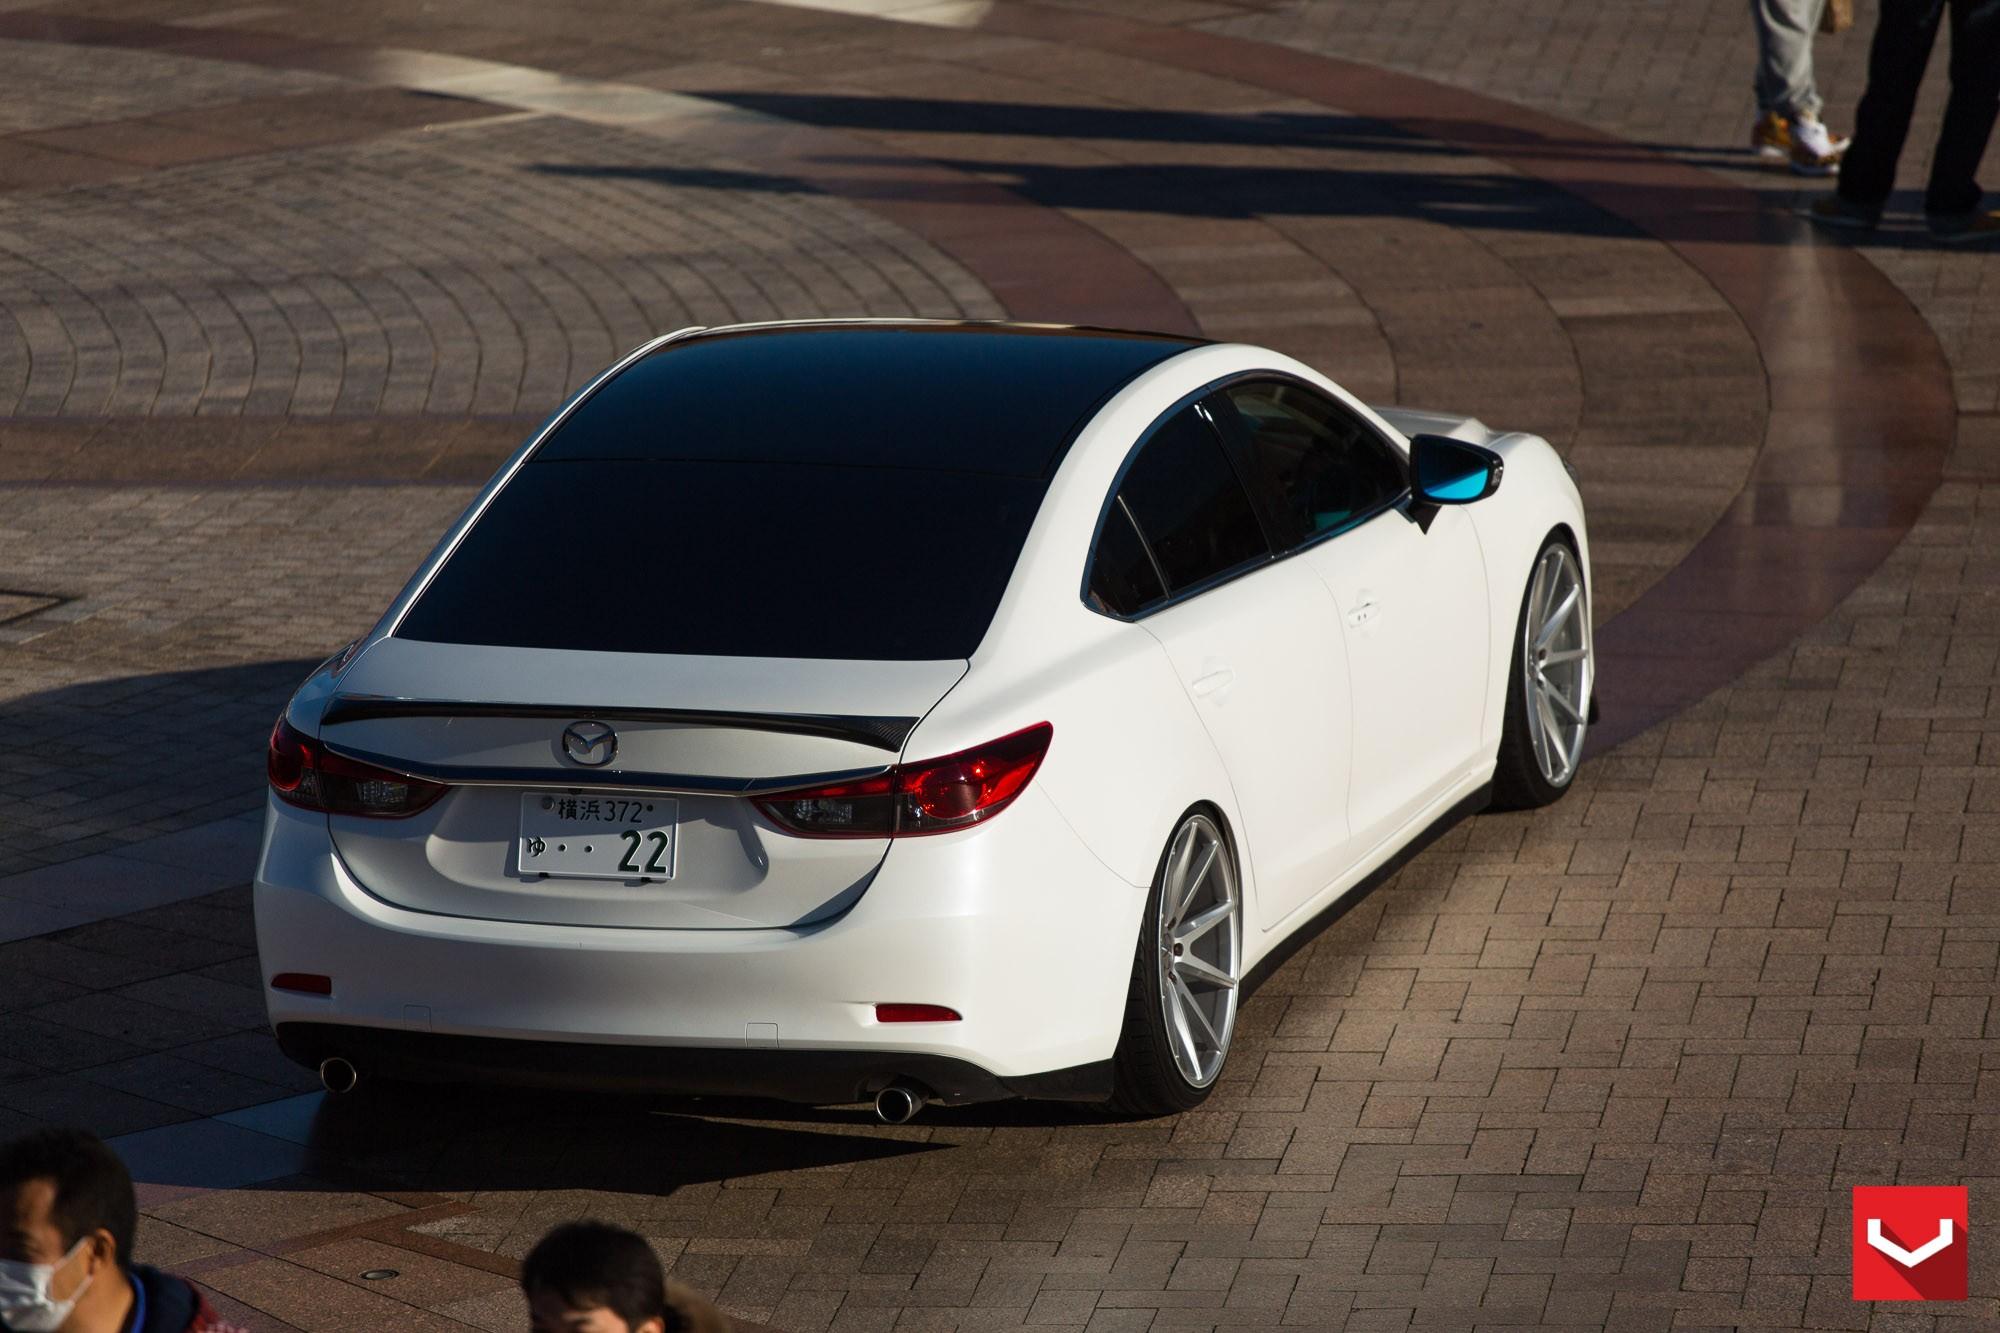 Mazda6 Gets Custom Vossen Wheels and Carbon Fiber Trim